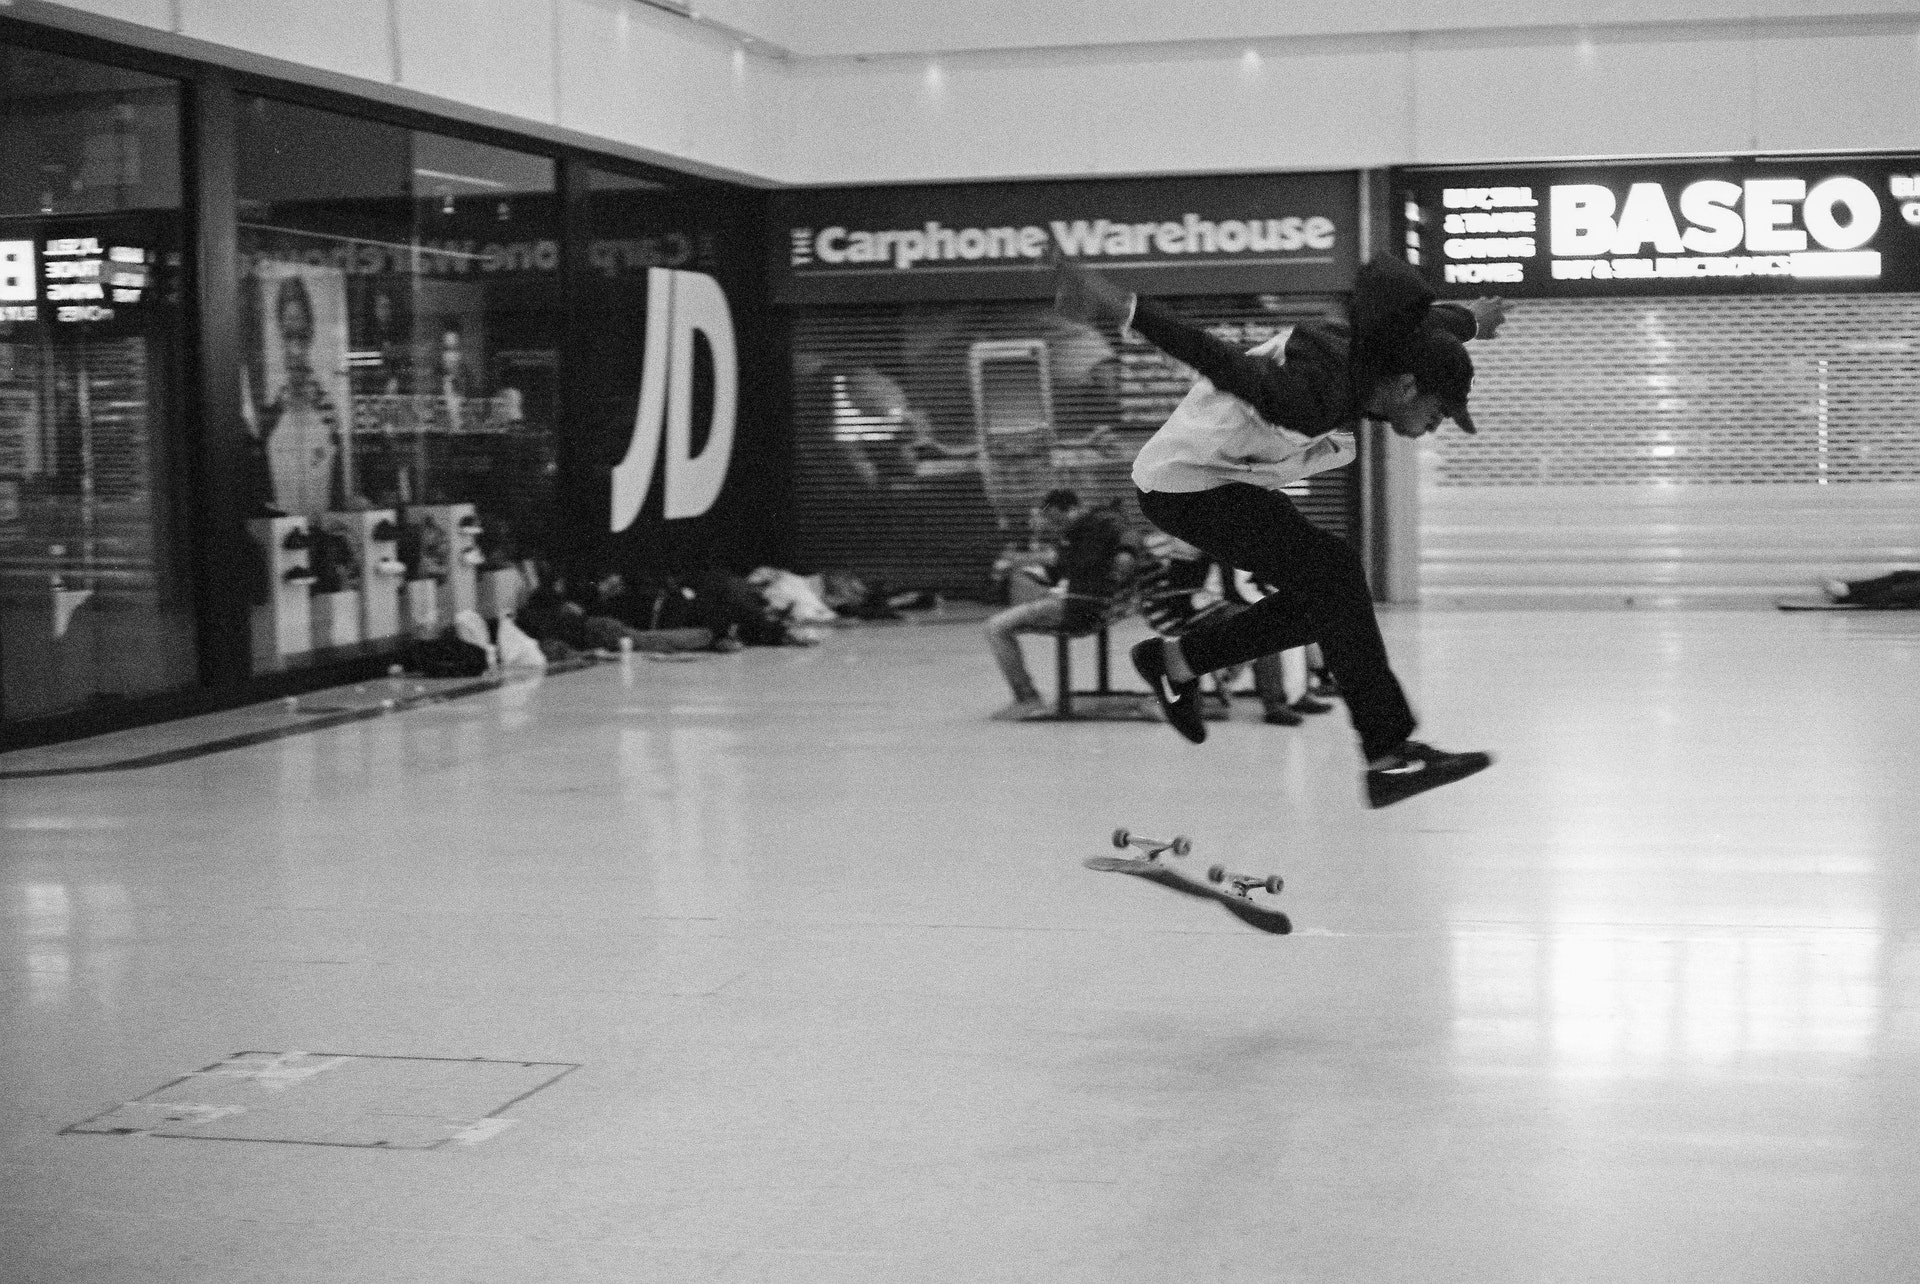 Stratford_Centre_Skaters_Lighter-20